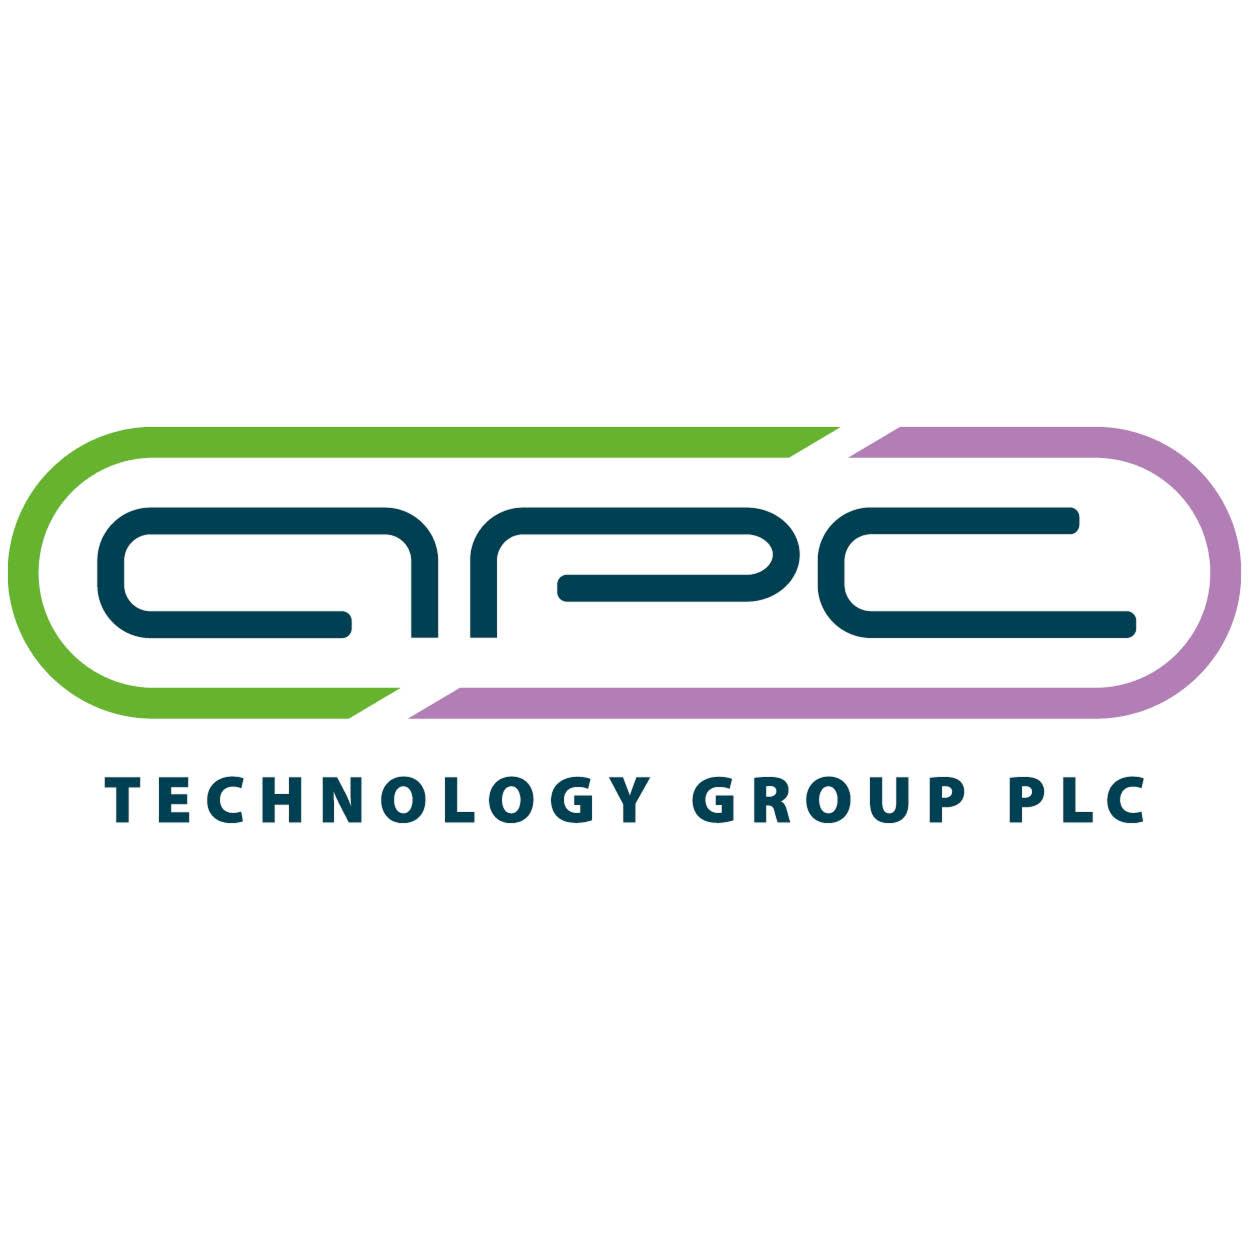 APC Technology Group